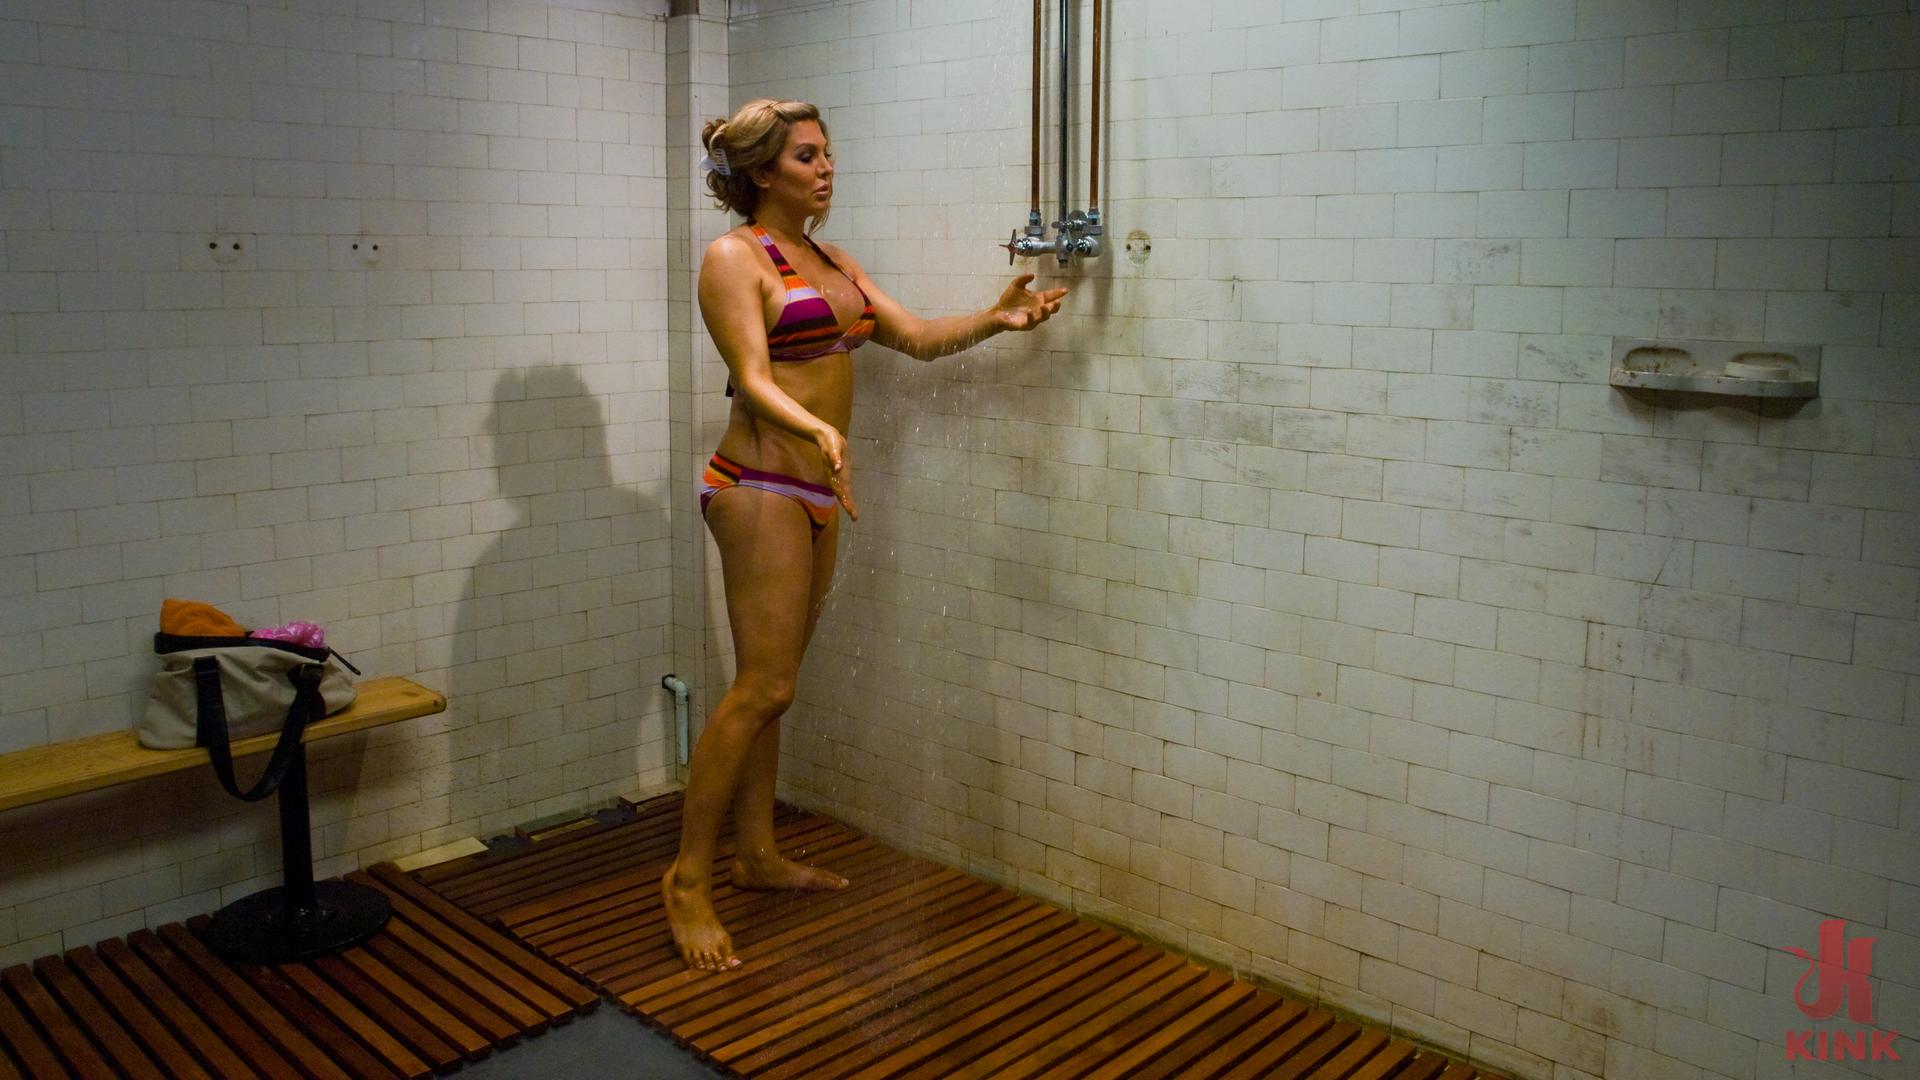 Photo number 2 from Carmen Cruz: Seduction in the Shower shot for TS Seduction on Kink.com. Featuring Carmen Cruz and Lobo in hardcore BDSM & Fetish porn.